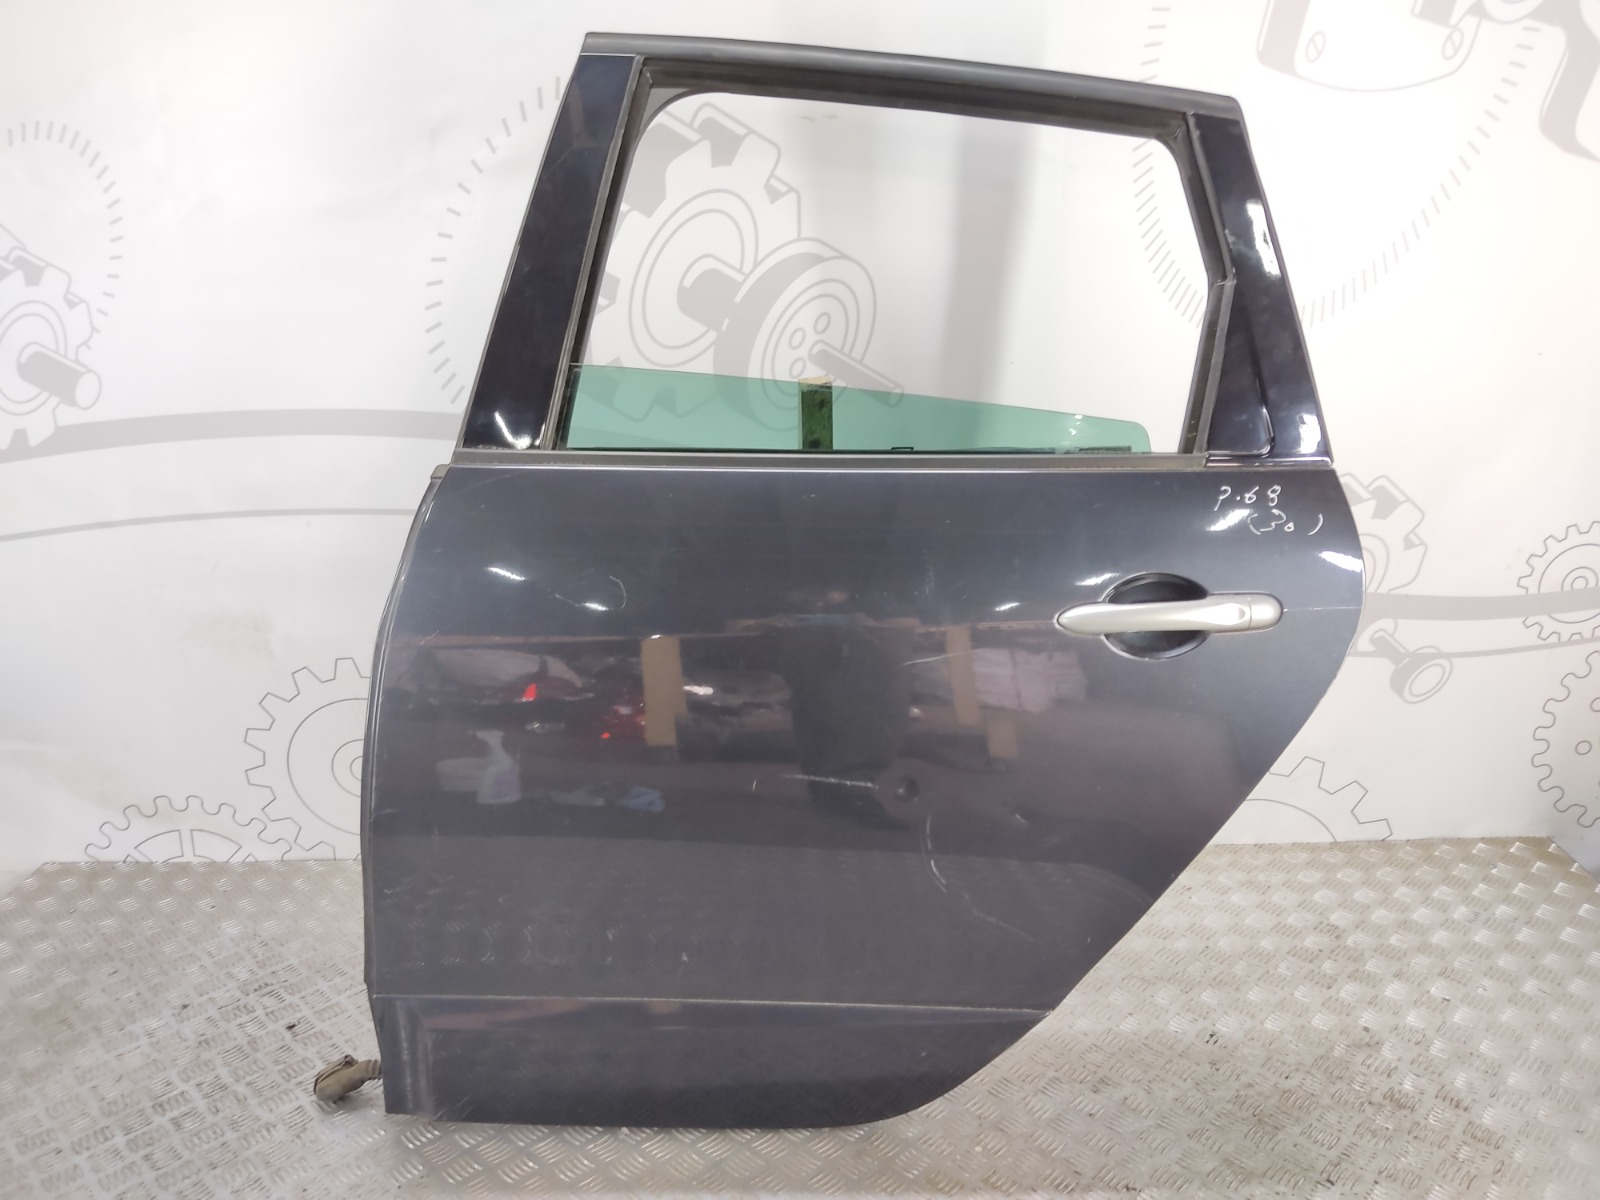 Дверь задняя левая Renault Grand Scenic 1.6 I 2011 (б/у)